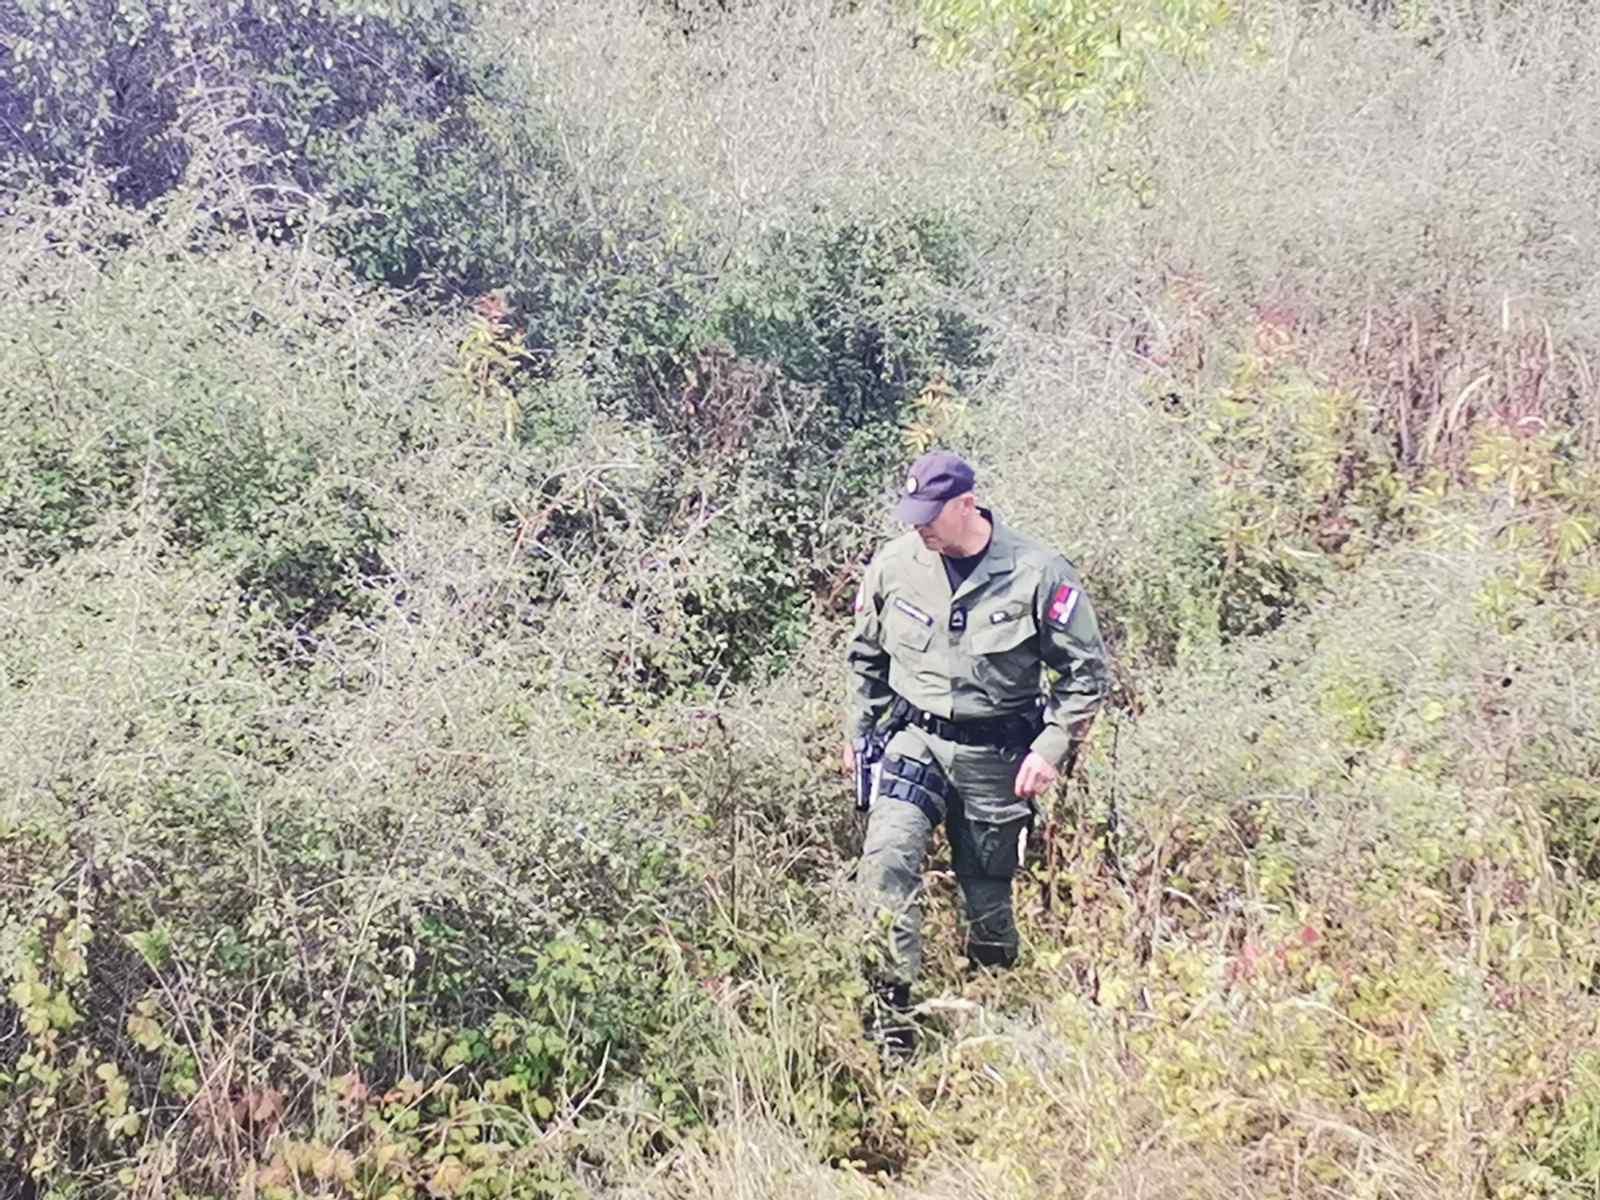 Aleksinac, potraga za nestalom porodicom, policija, nestala porodica